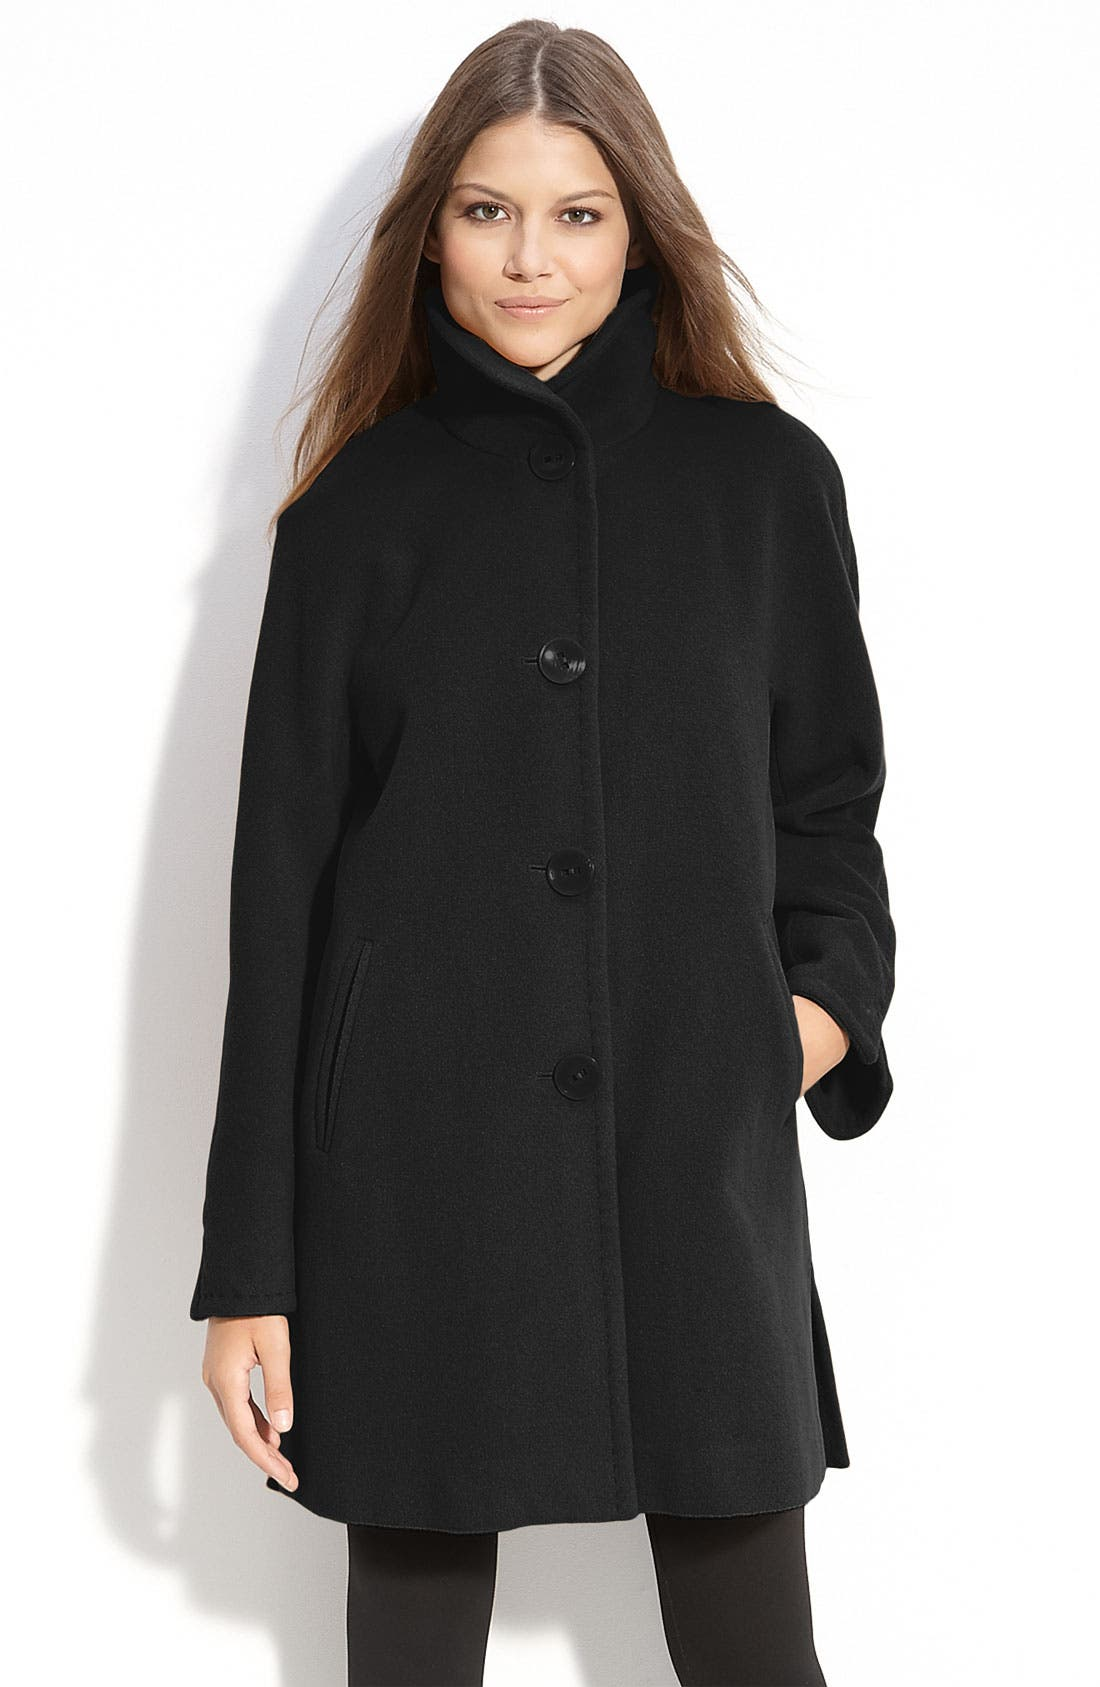 ELLEN TRACY, A-Line Wool Blend Coat, Main thumbnail 1, color, 001